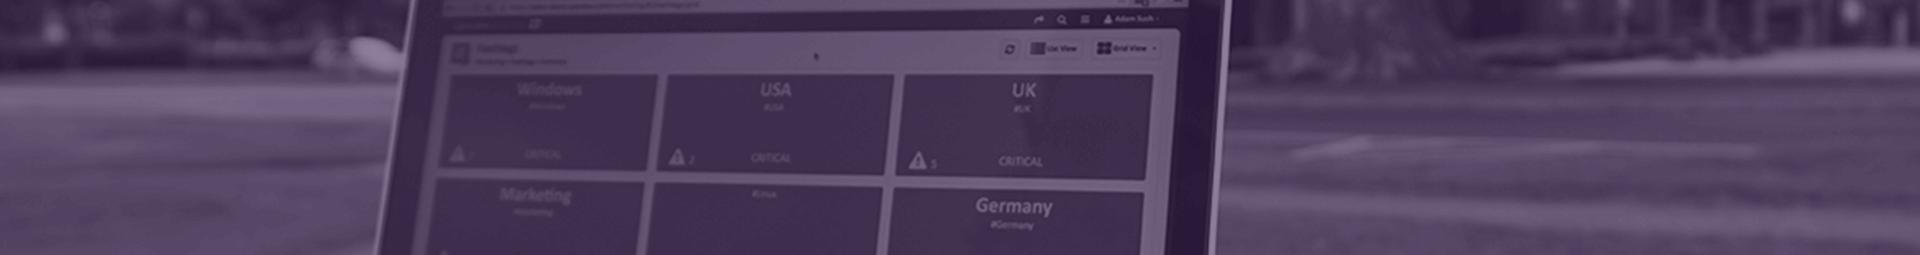 Windows Monitoring Tools